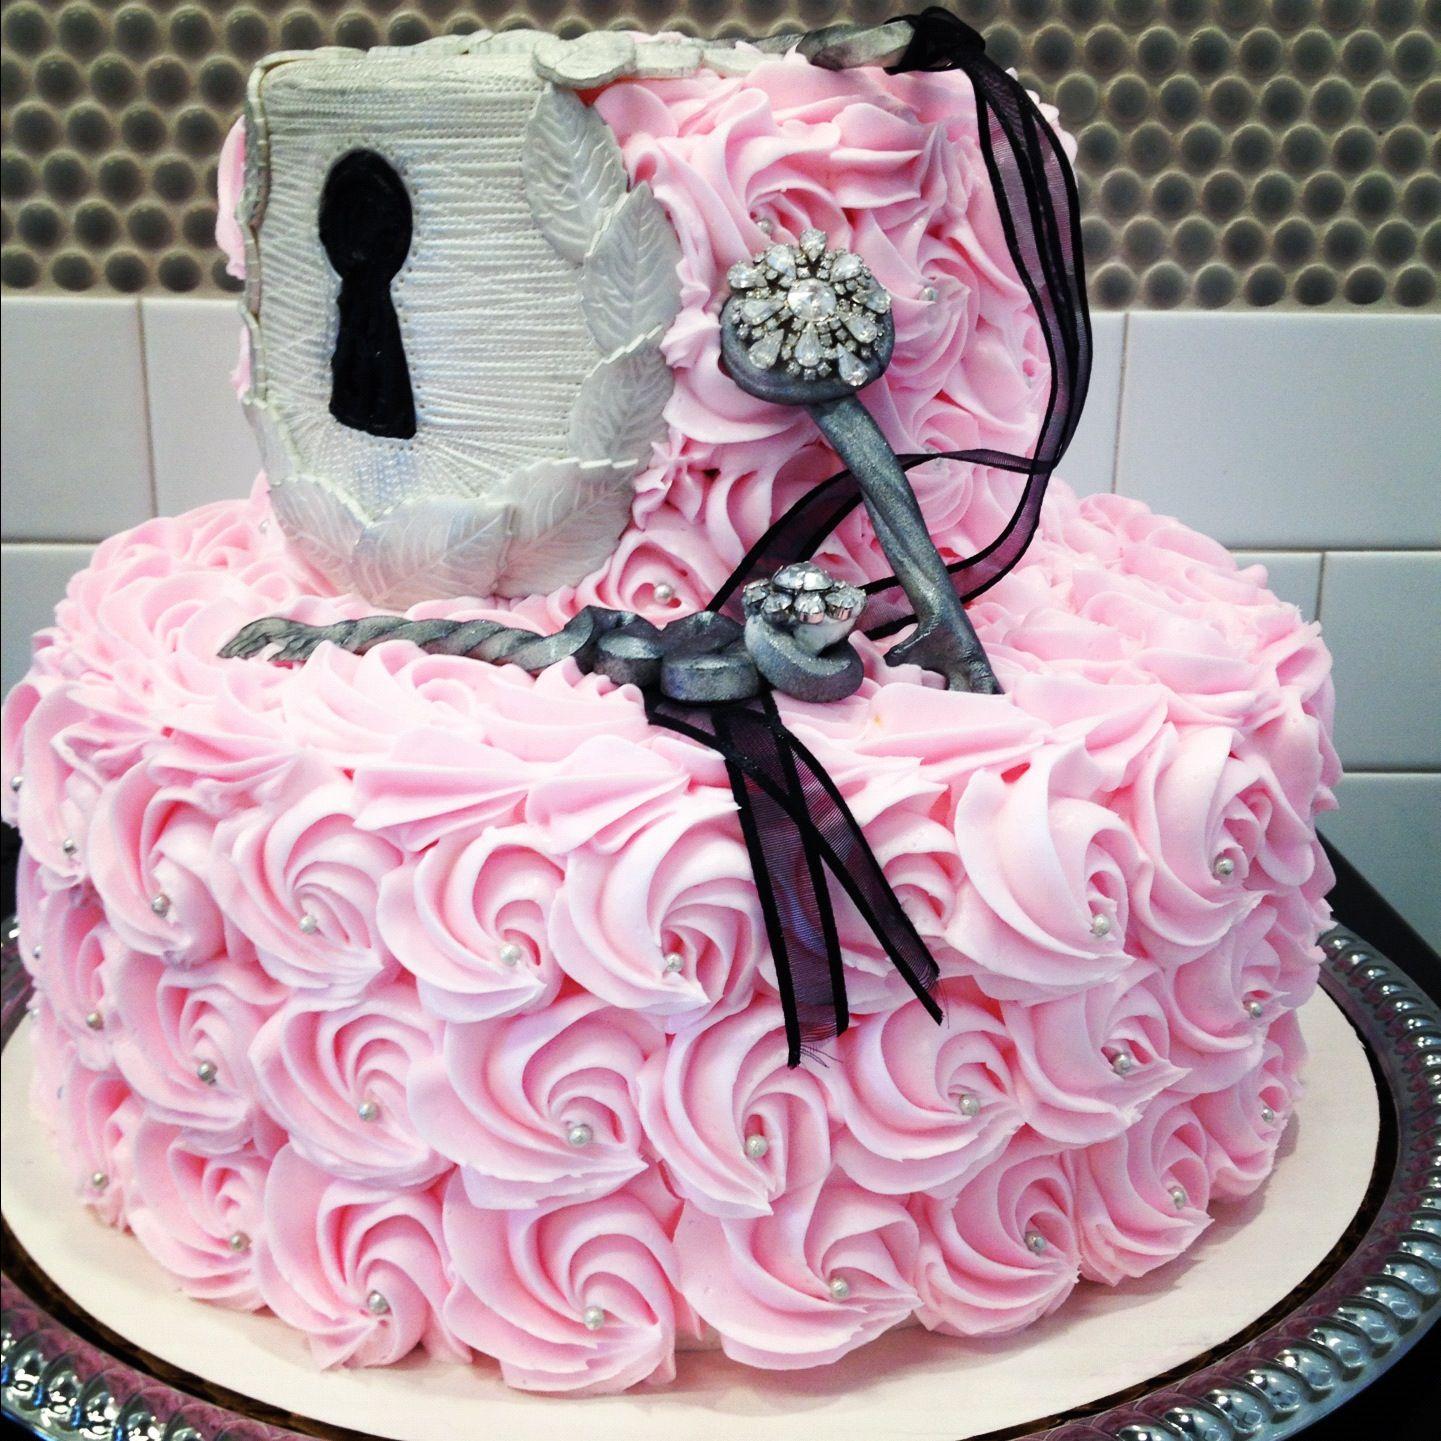 Lock and key cake 21st cake, Cake design, Cake decorating